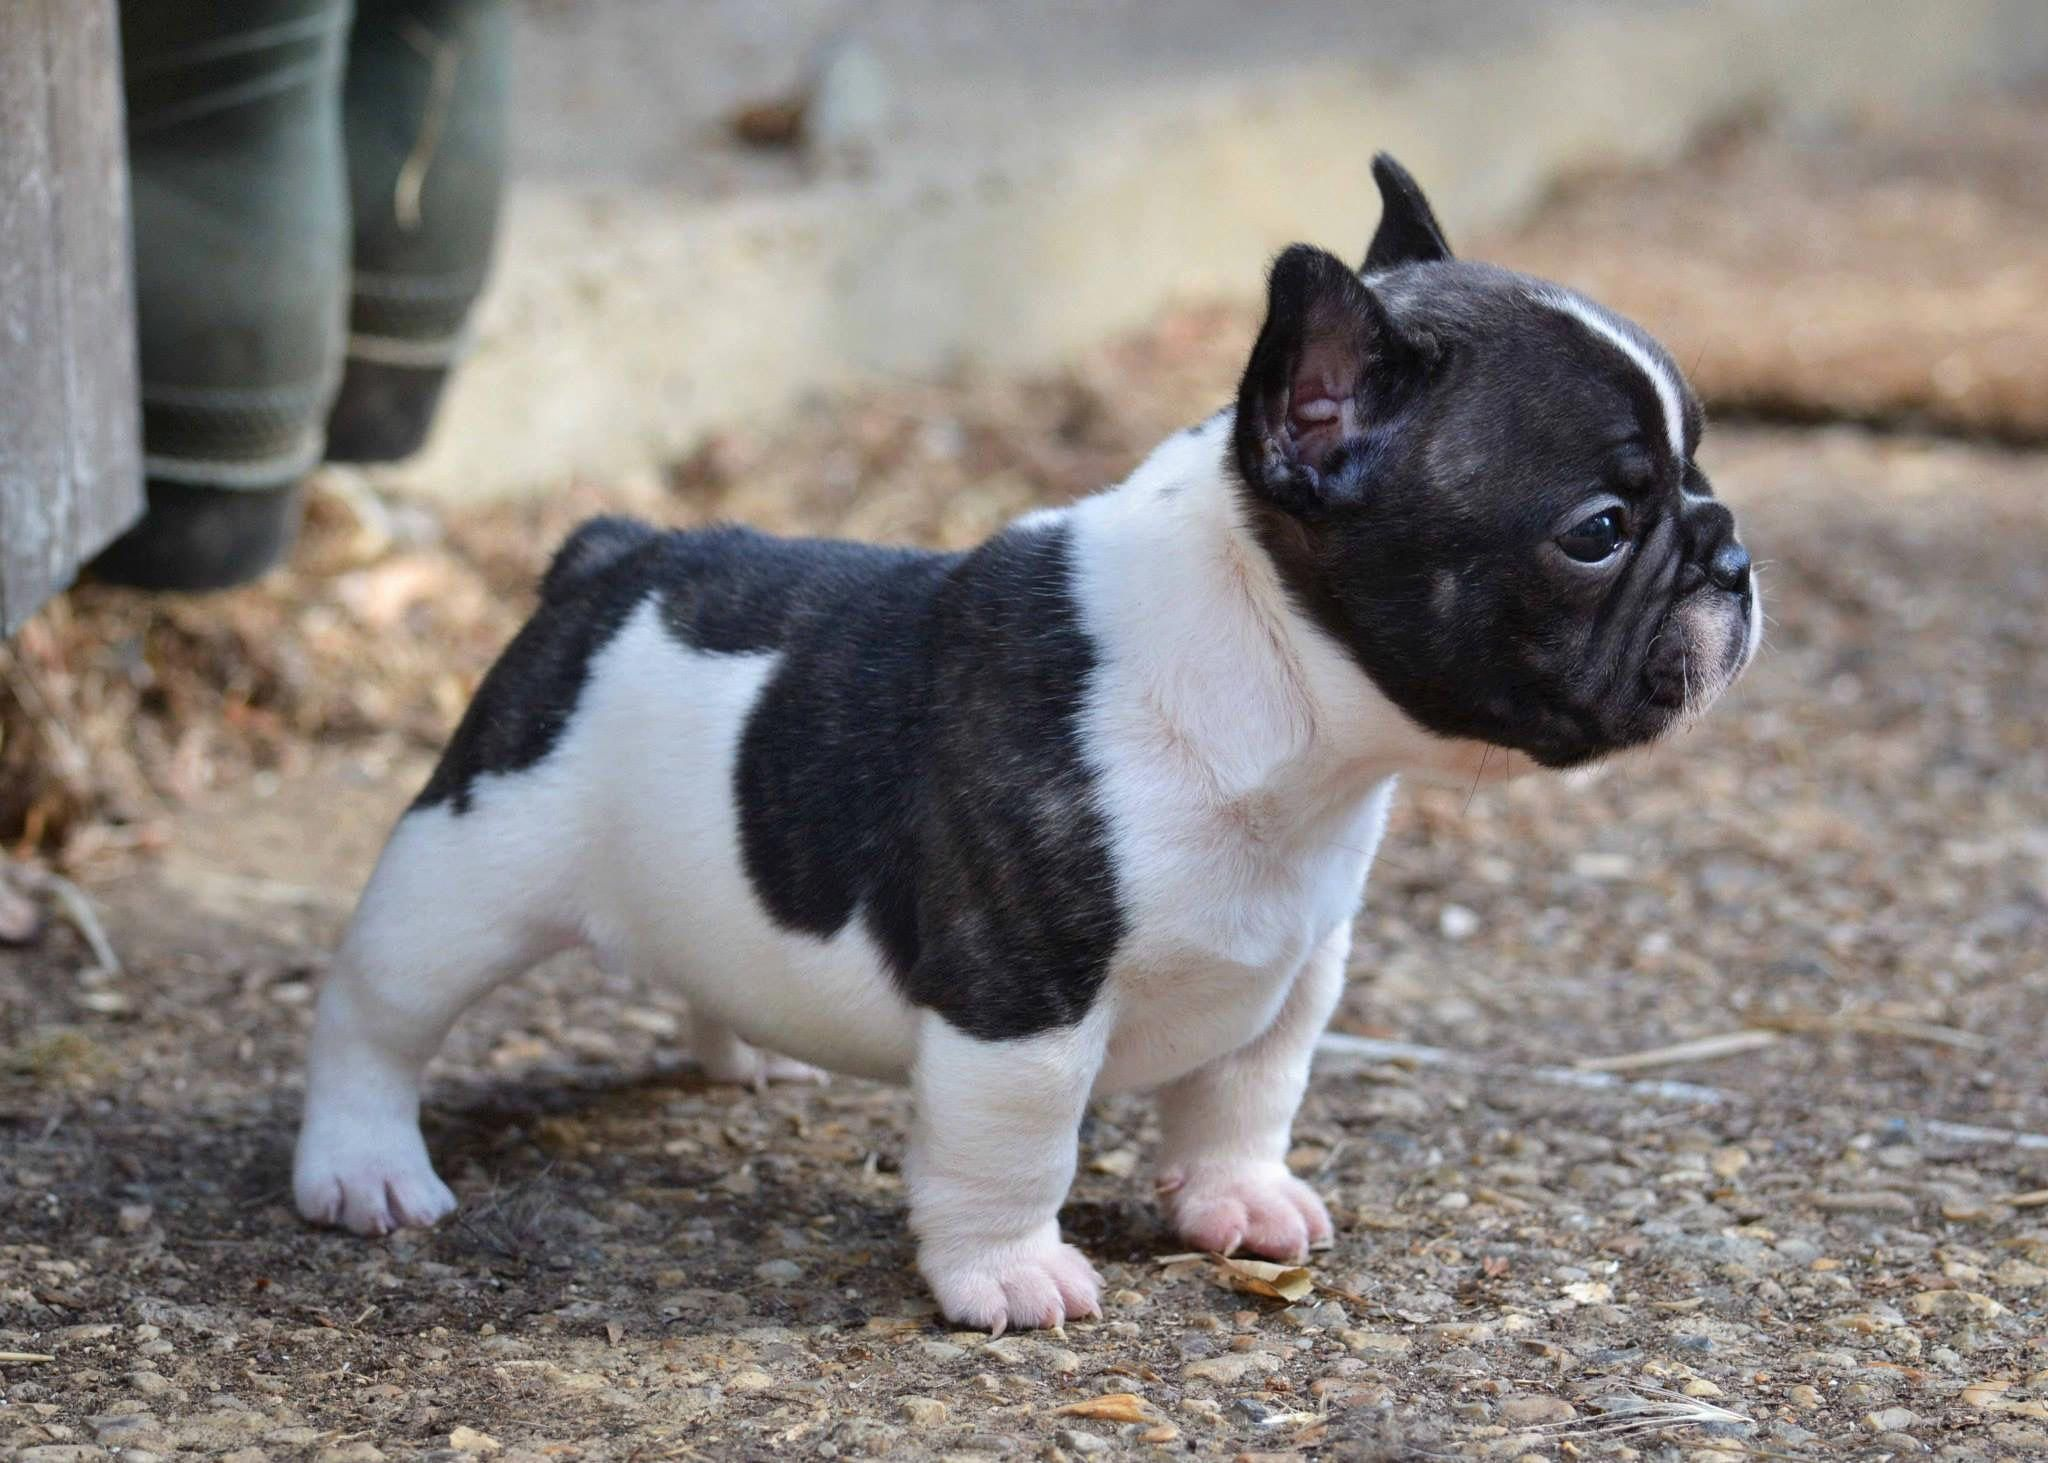 You Can T Get Me I M Big French Bulldog Puppies Cute Animals Bulldog Puppies